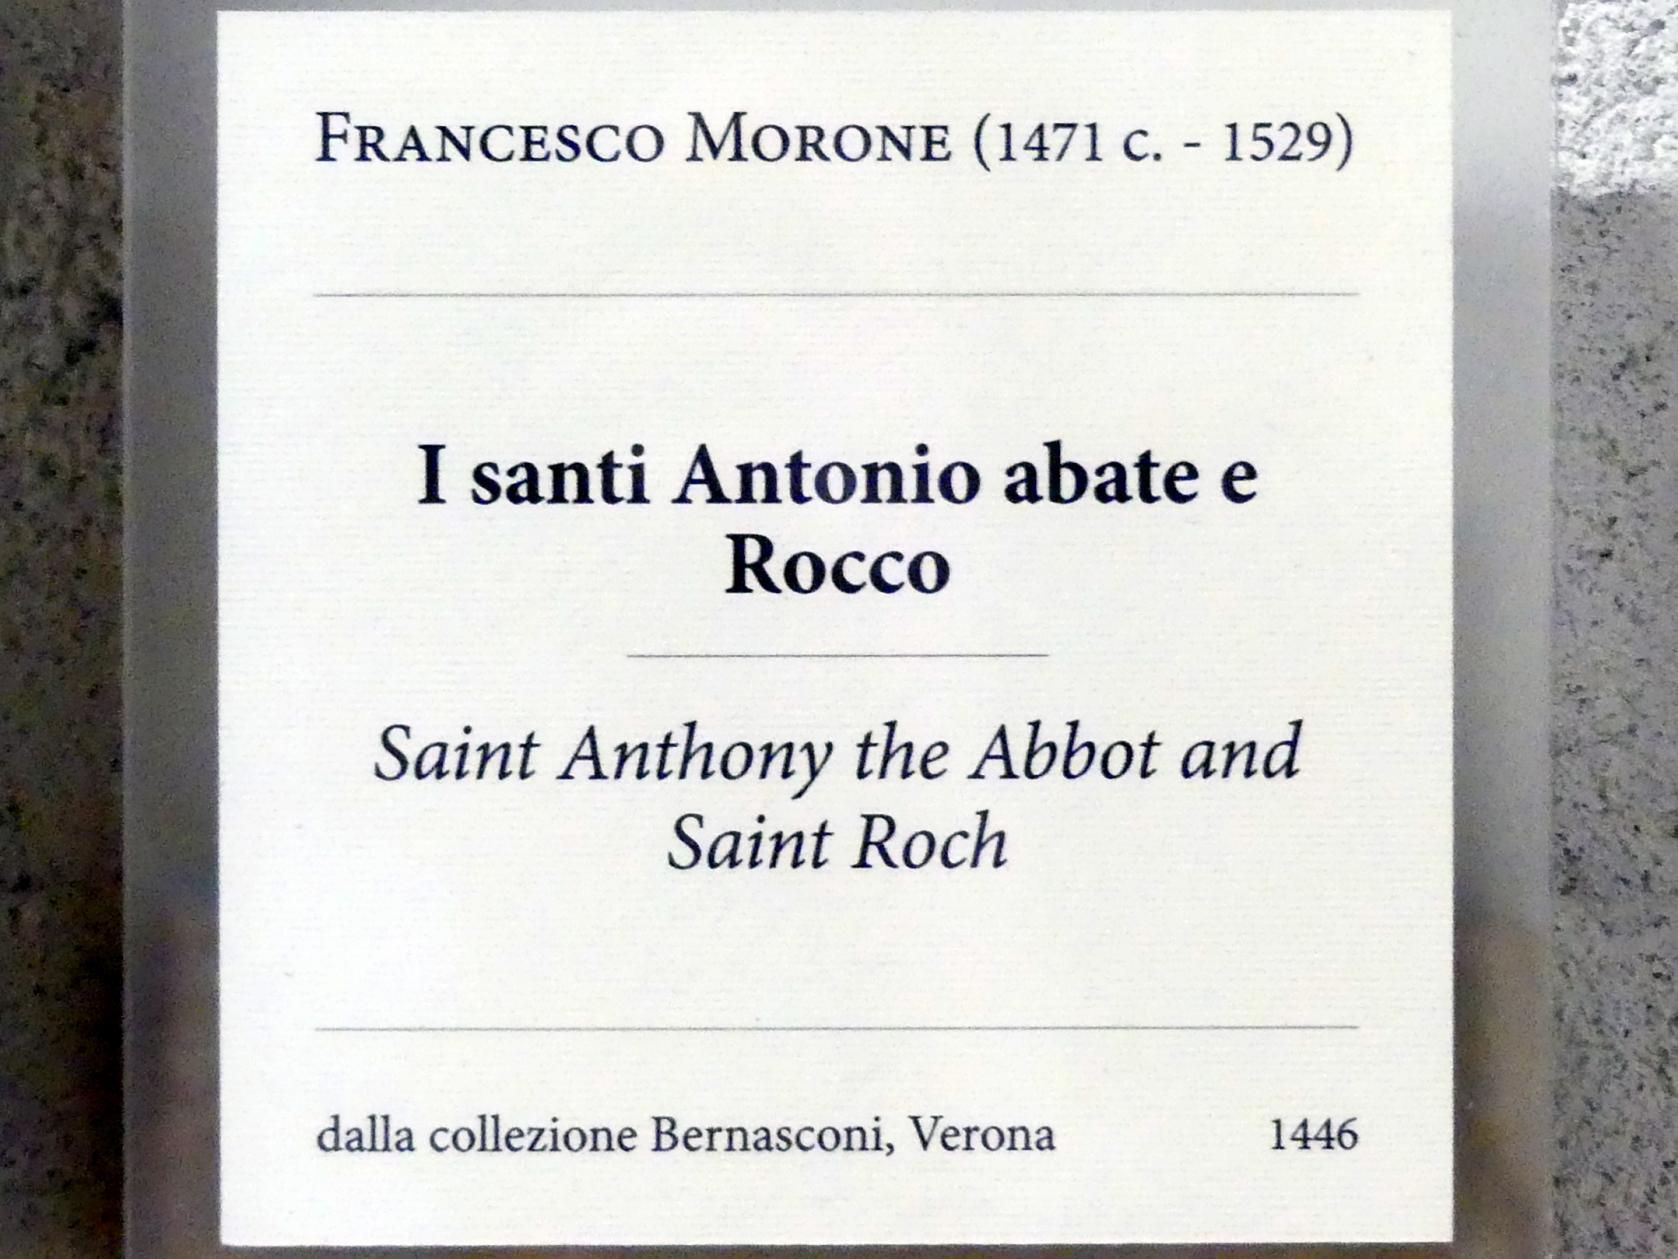 Francesco Morone: Die Heiligen Antonius und Rochus, Undatiert, Bild 2/2